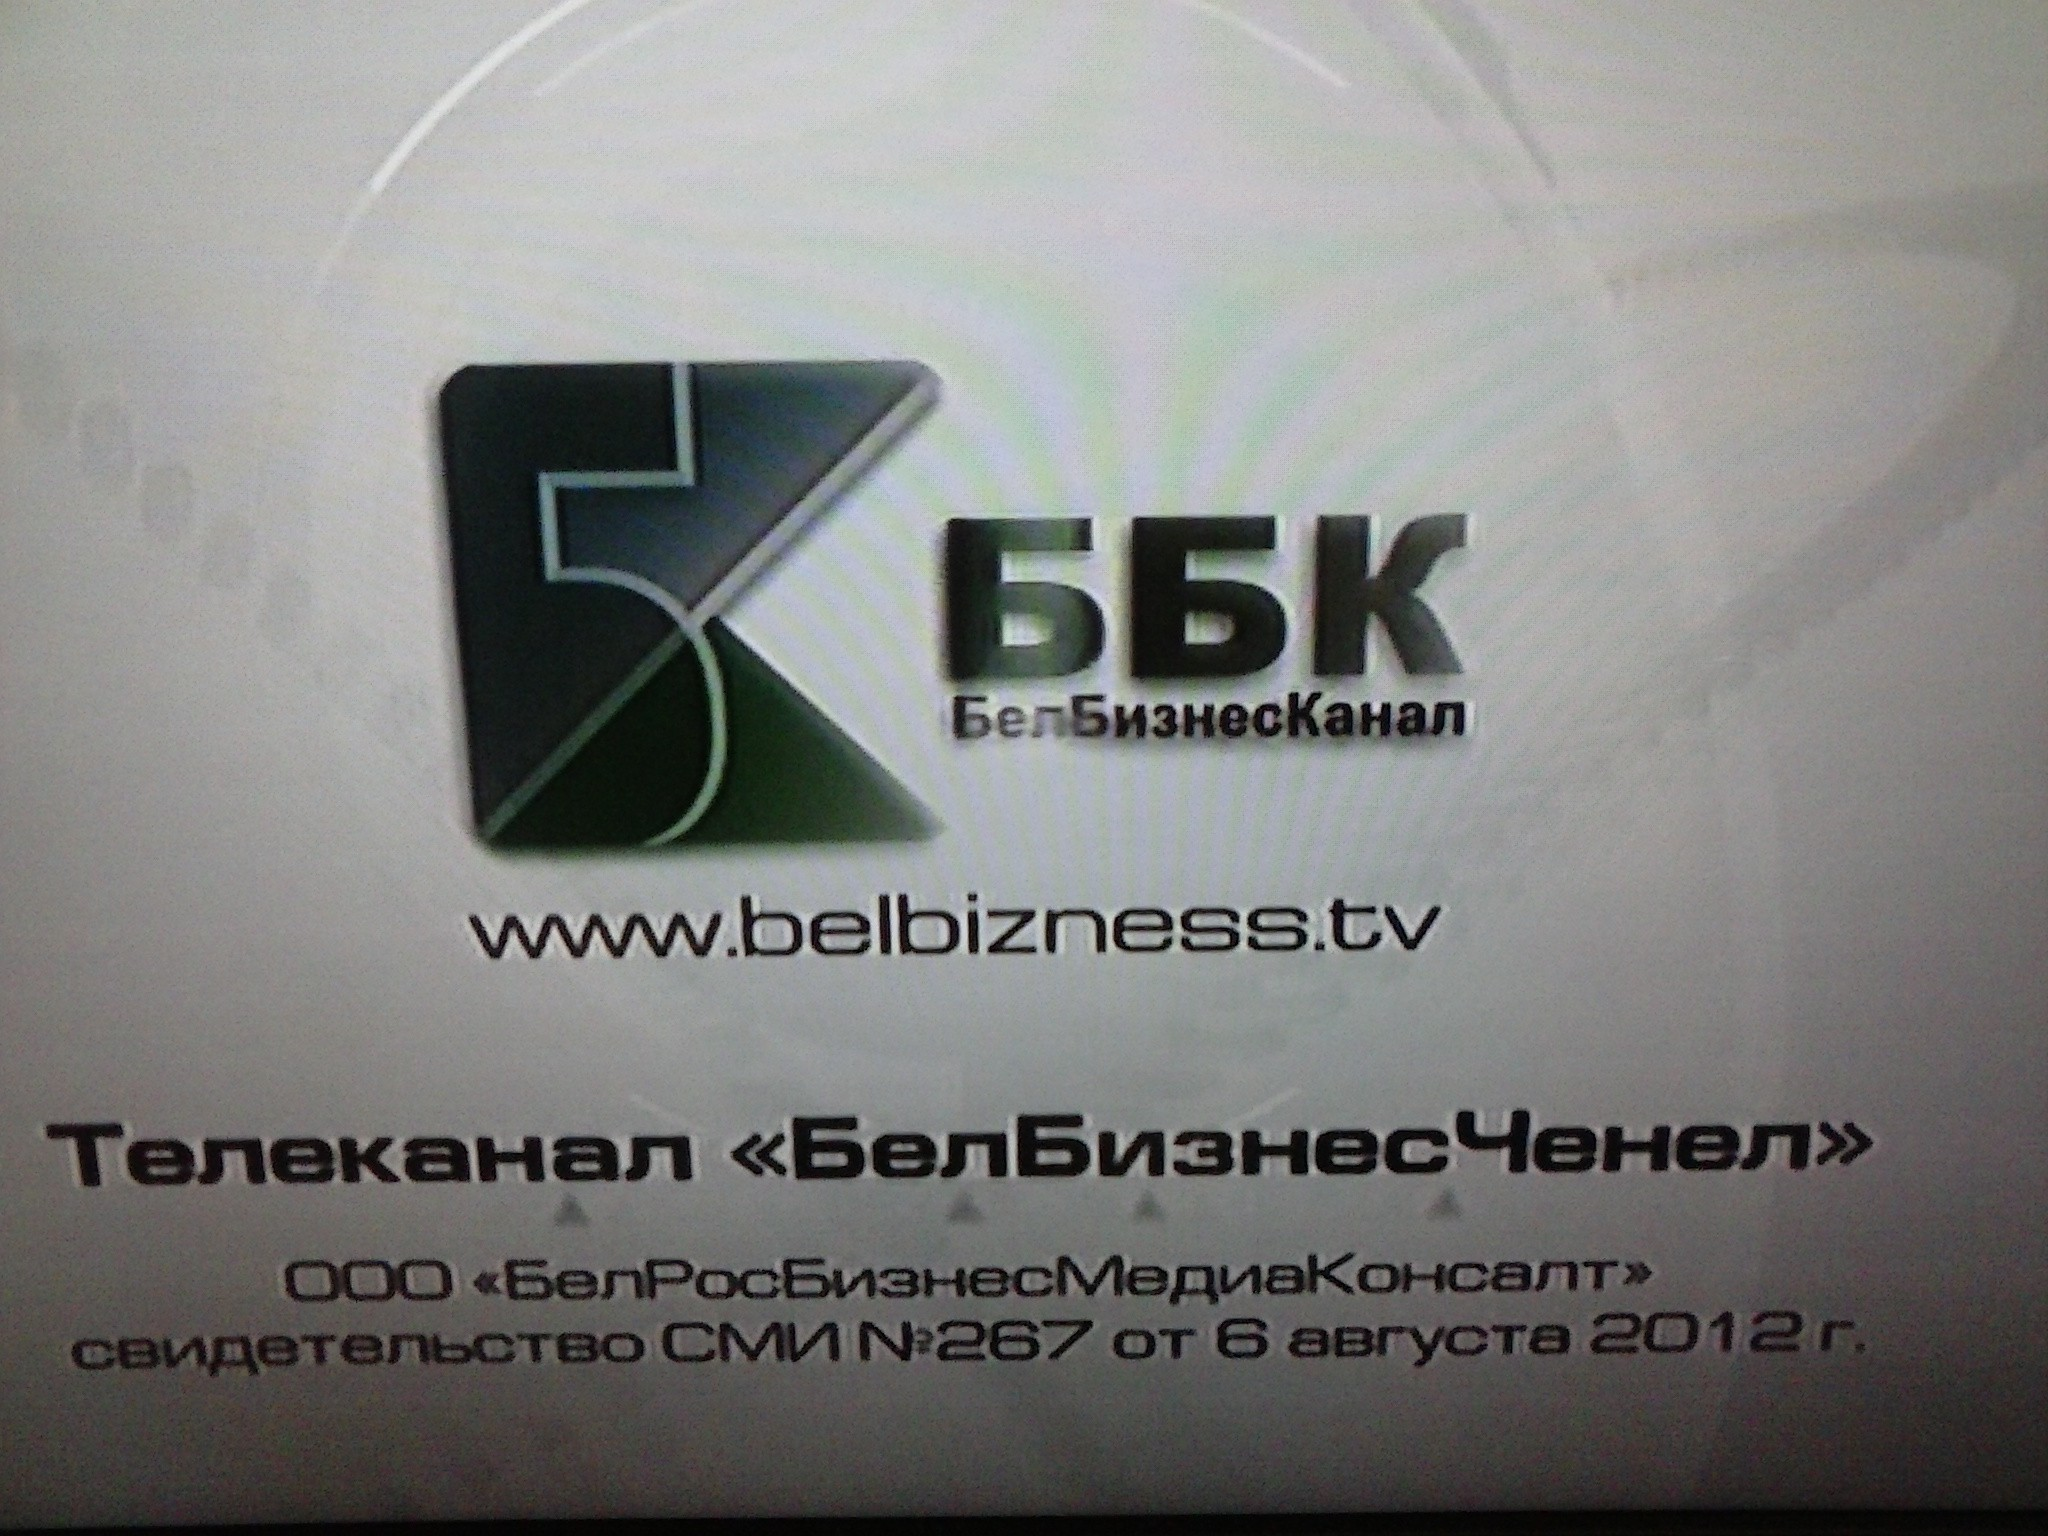 Телекана БелБизнесЧенел. Республика Беларусь